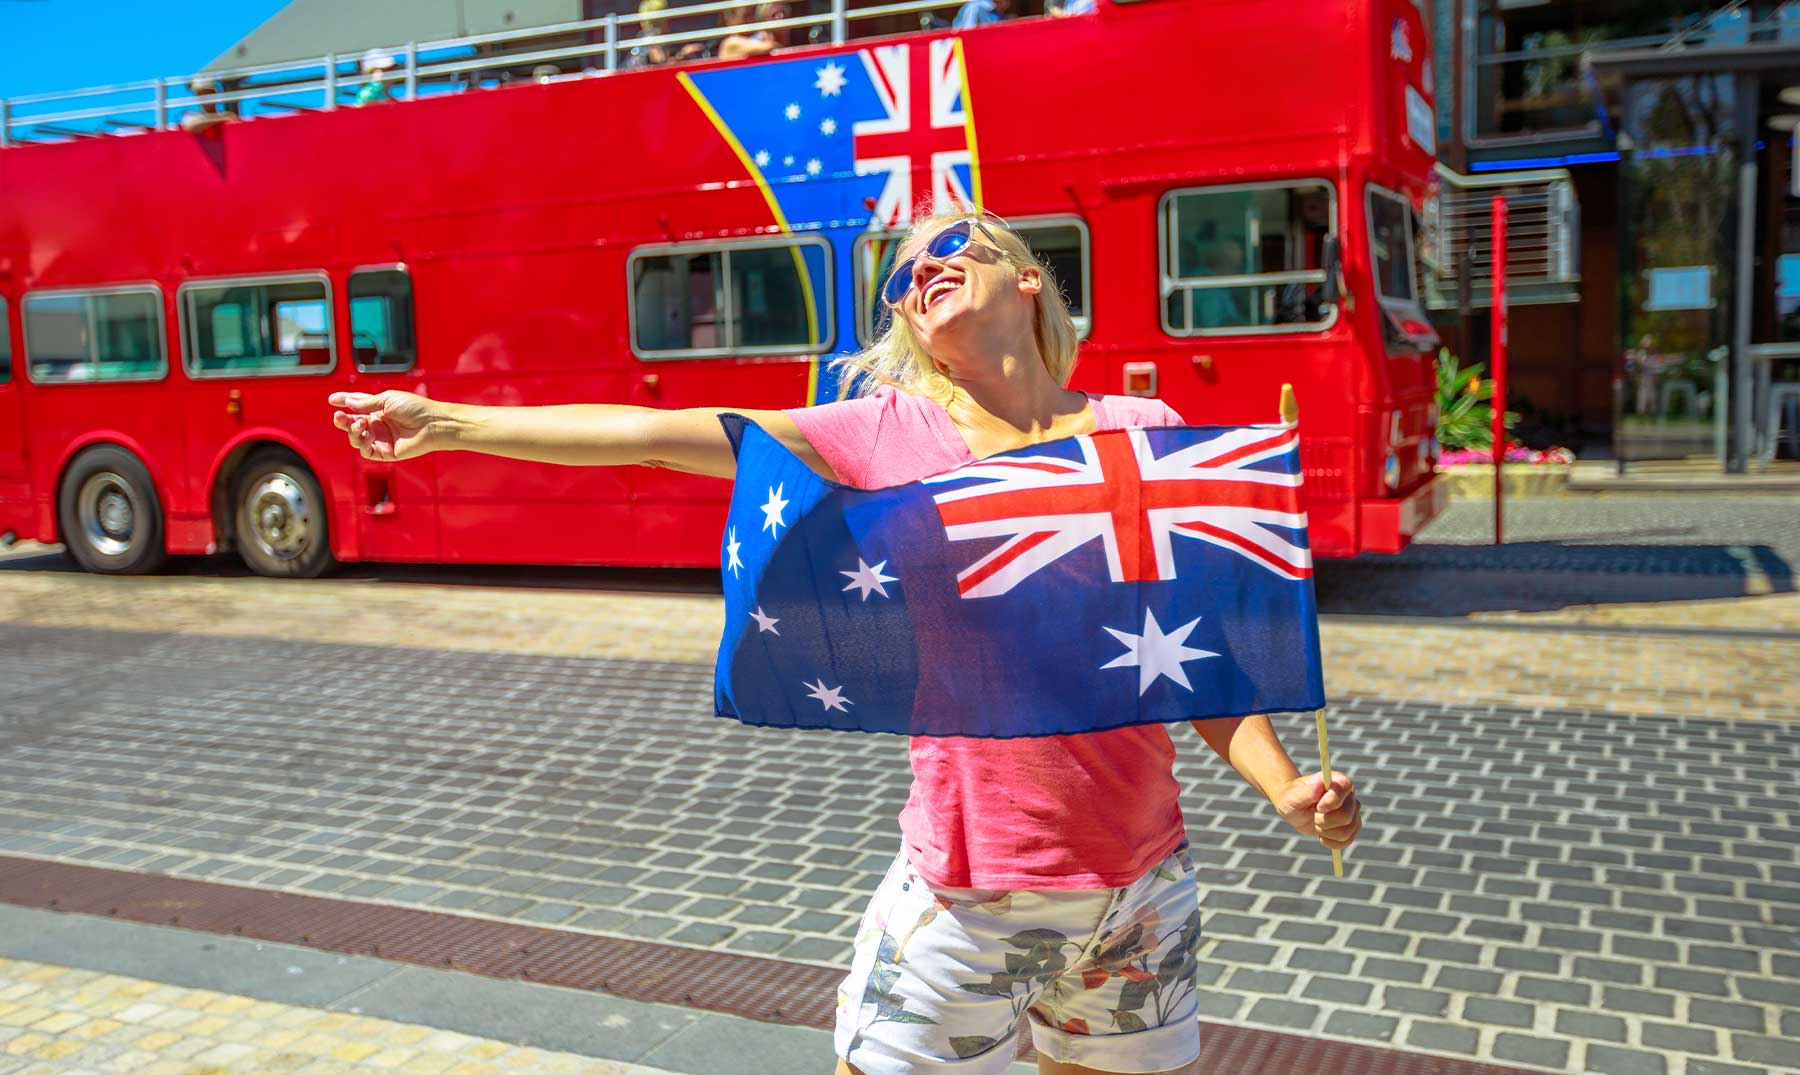 Bandera de Australia | ¡Conoce su significado e historia!